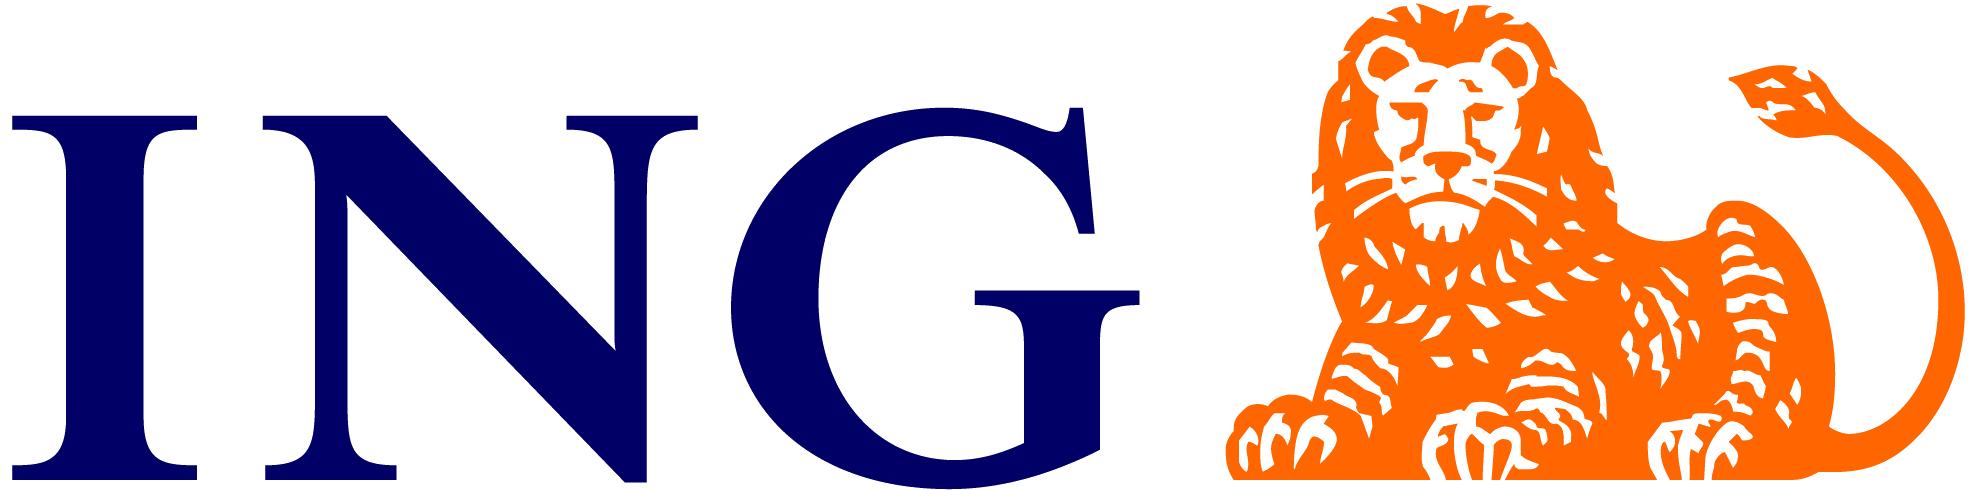 Znalezione obrazy dla zapytania ing bank logo